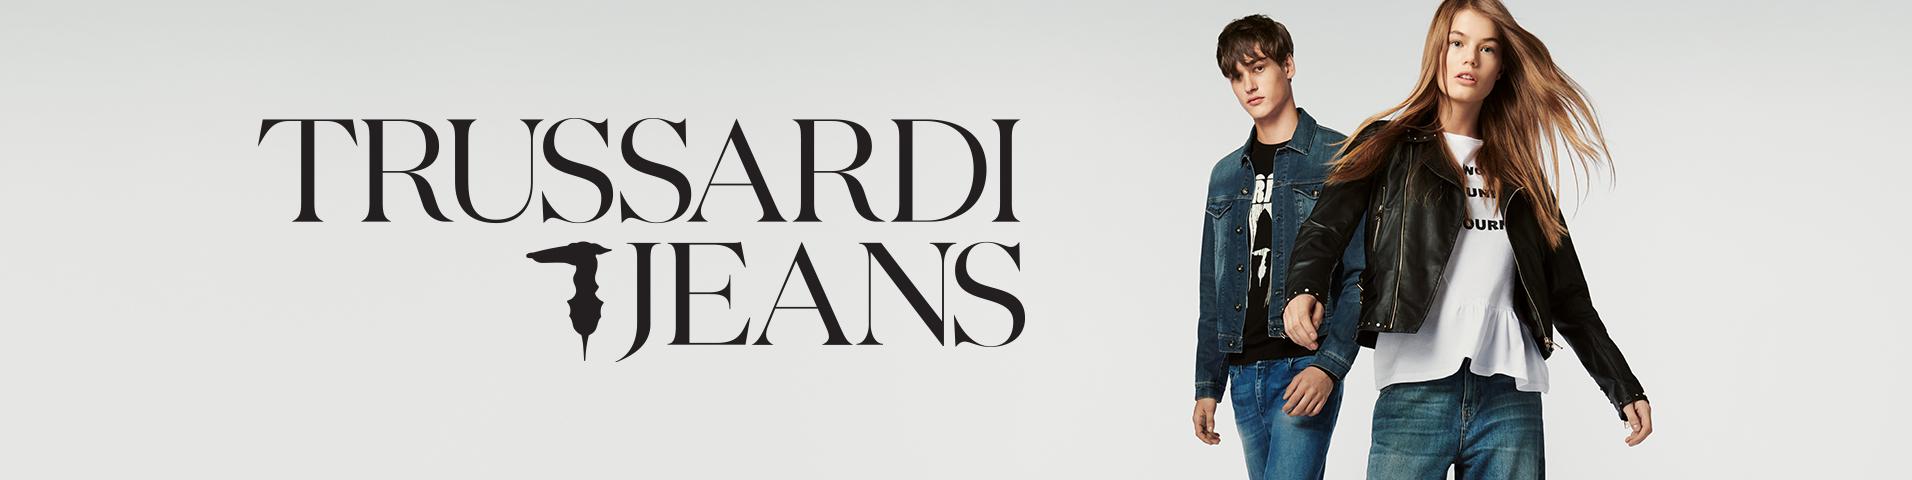 Accessories from Trussardi Jeans 2c58f30ffa4